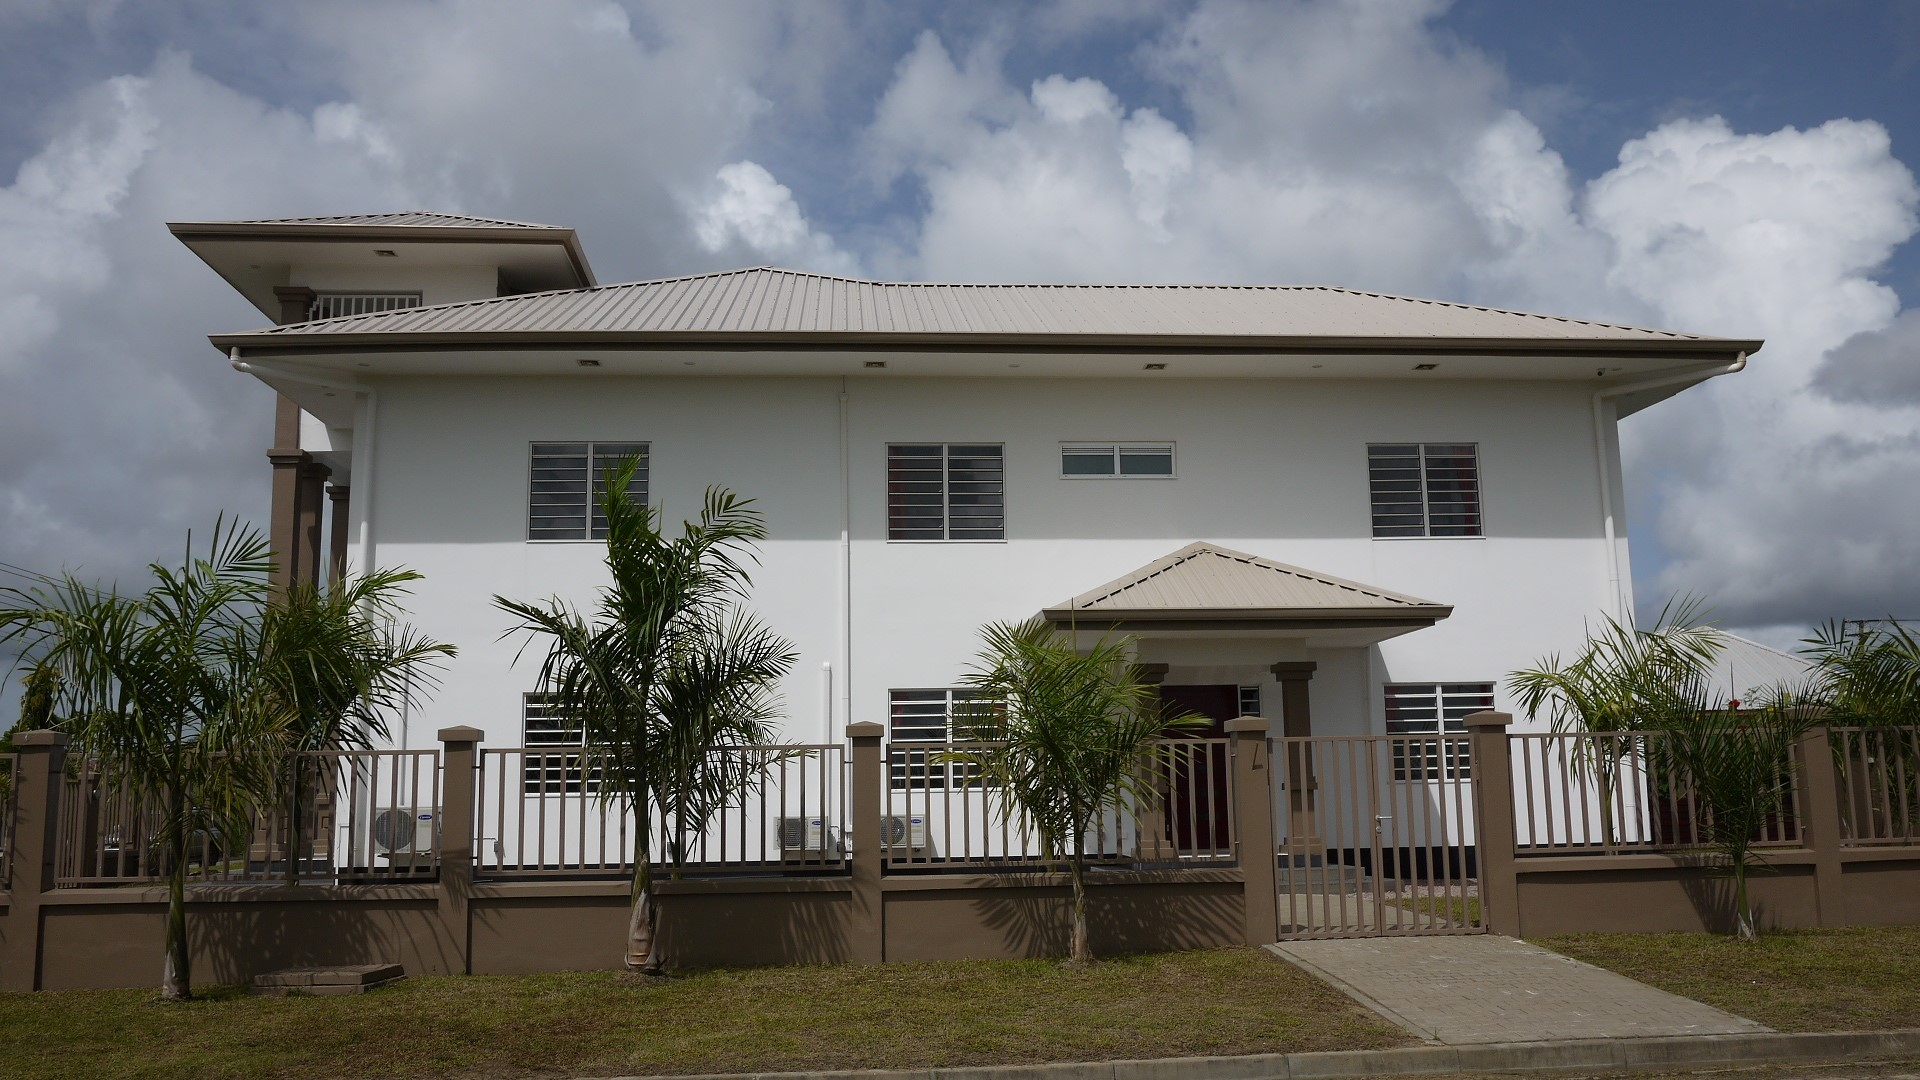 Gansistraat-Morgenstond-Paramaribo-Suriname-Terzol-Vastgoed-s23